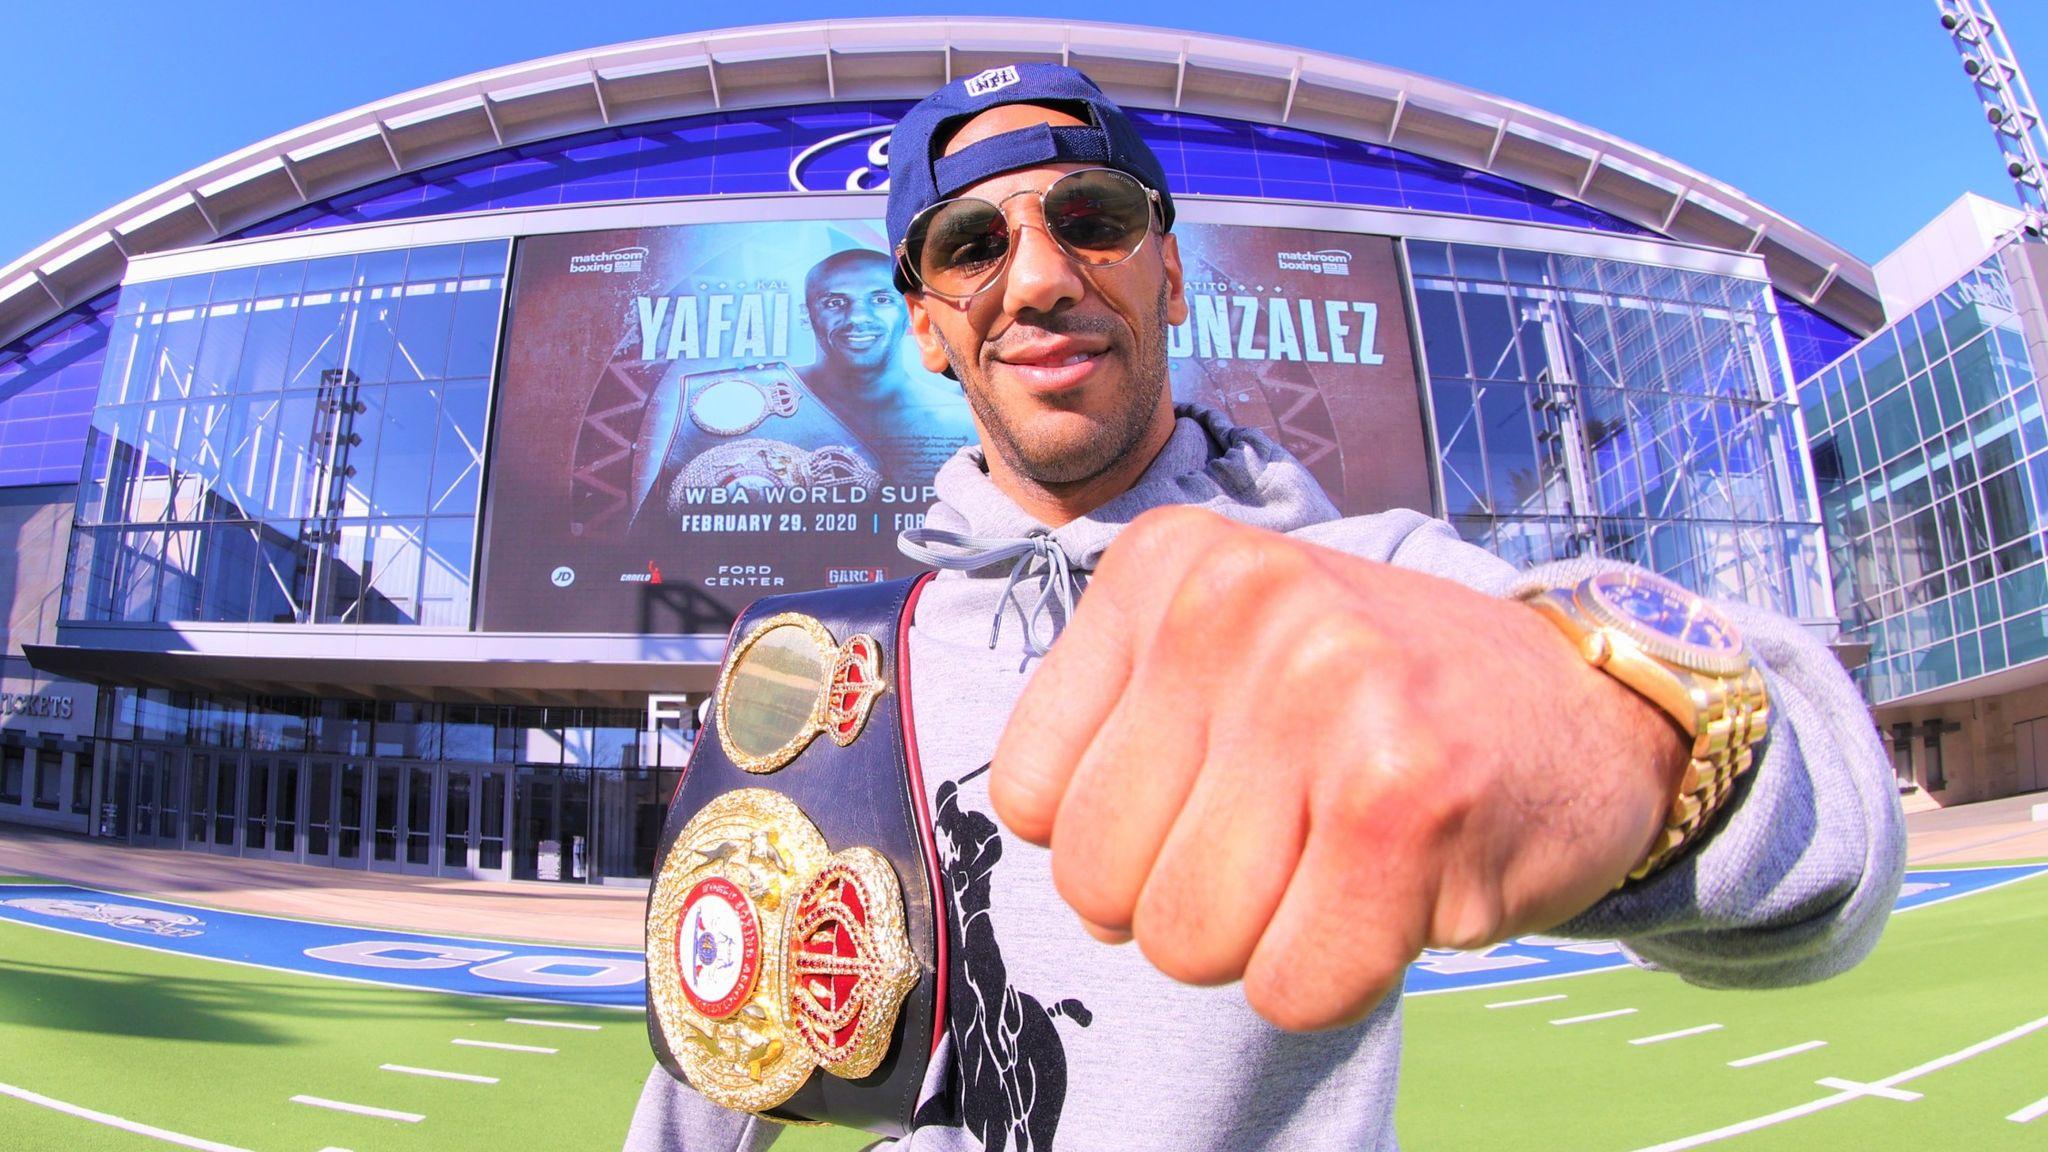 Alexis Texas Boxing yafai: i'm fighting my idol